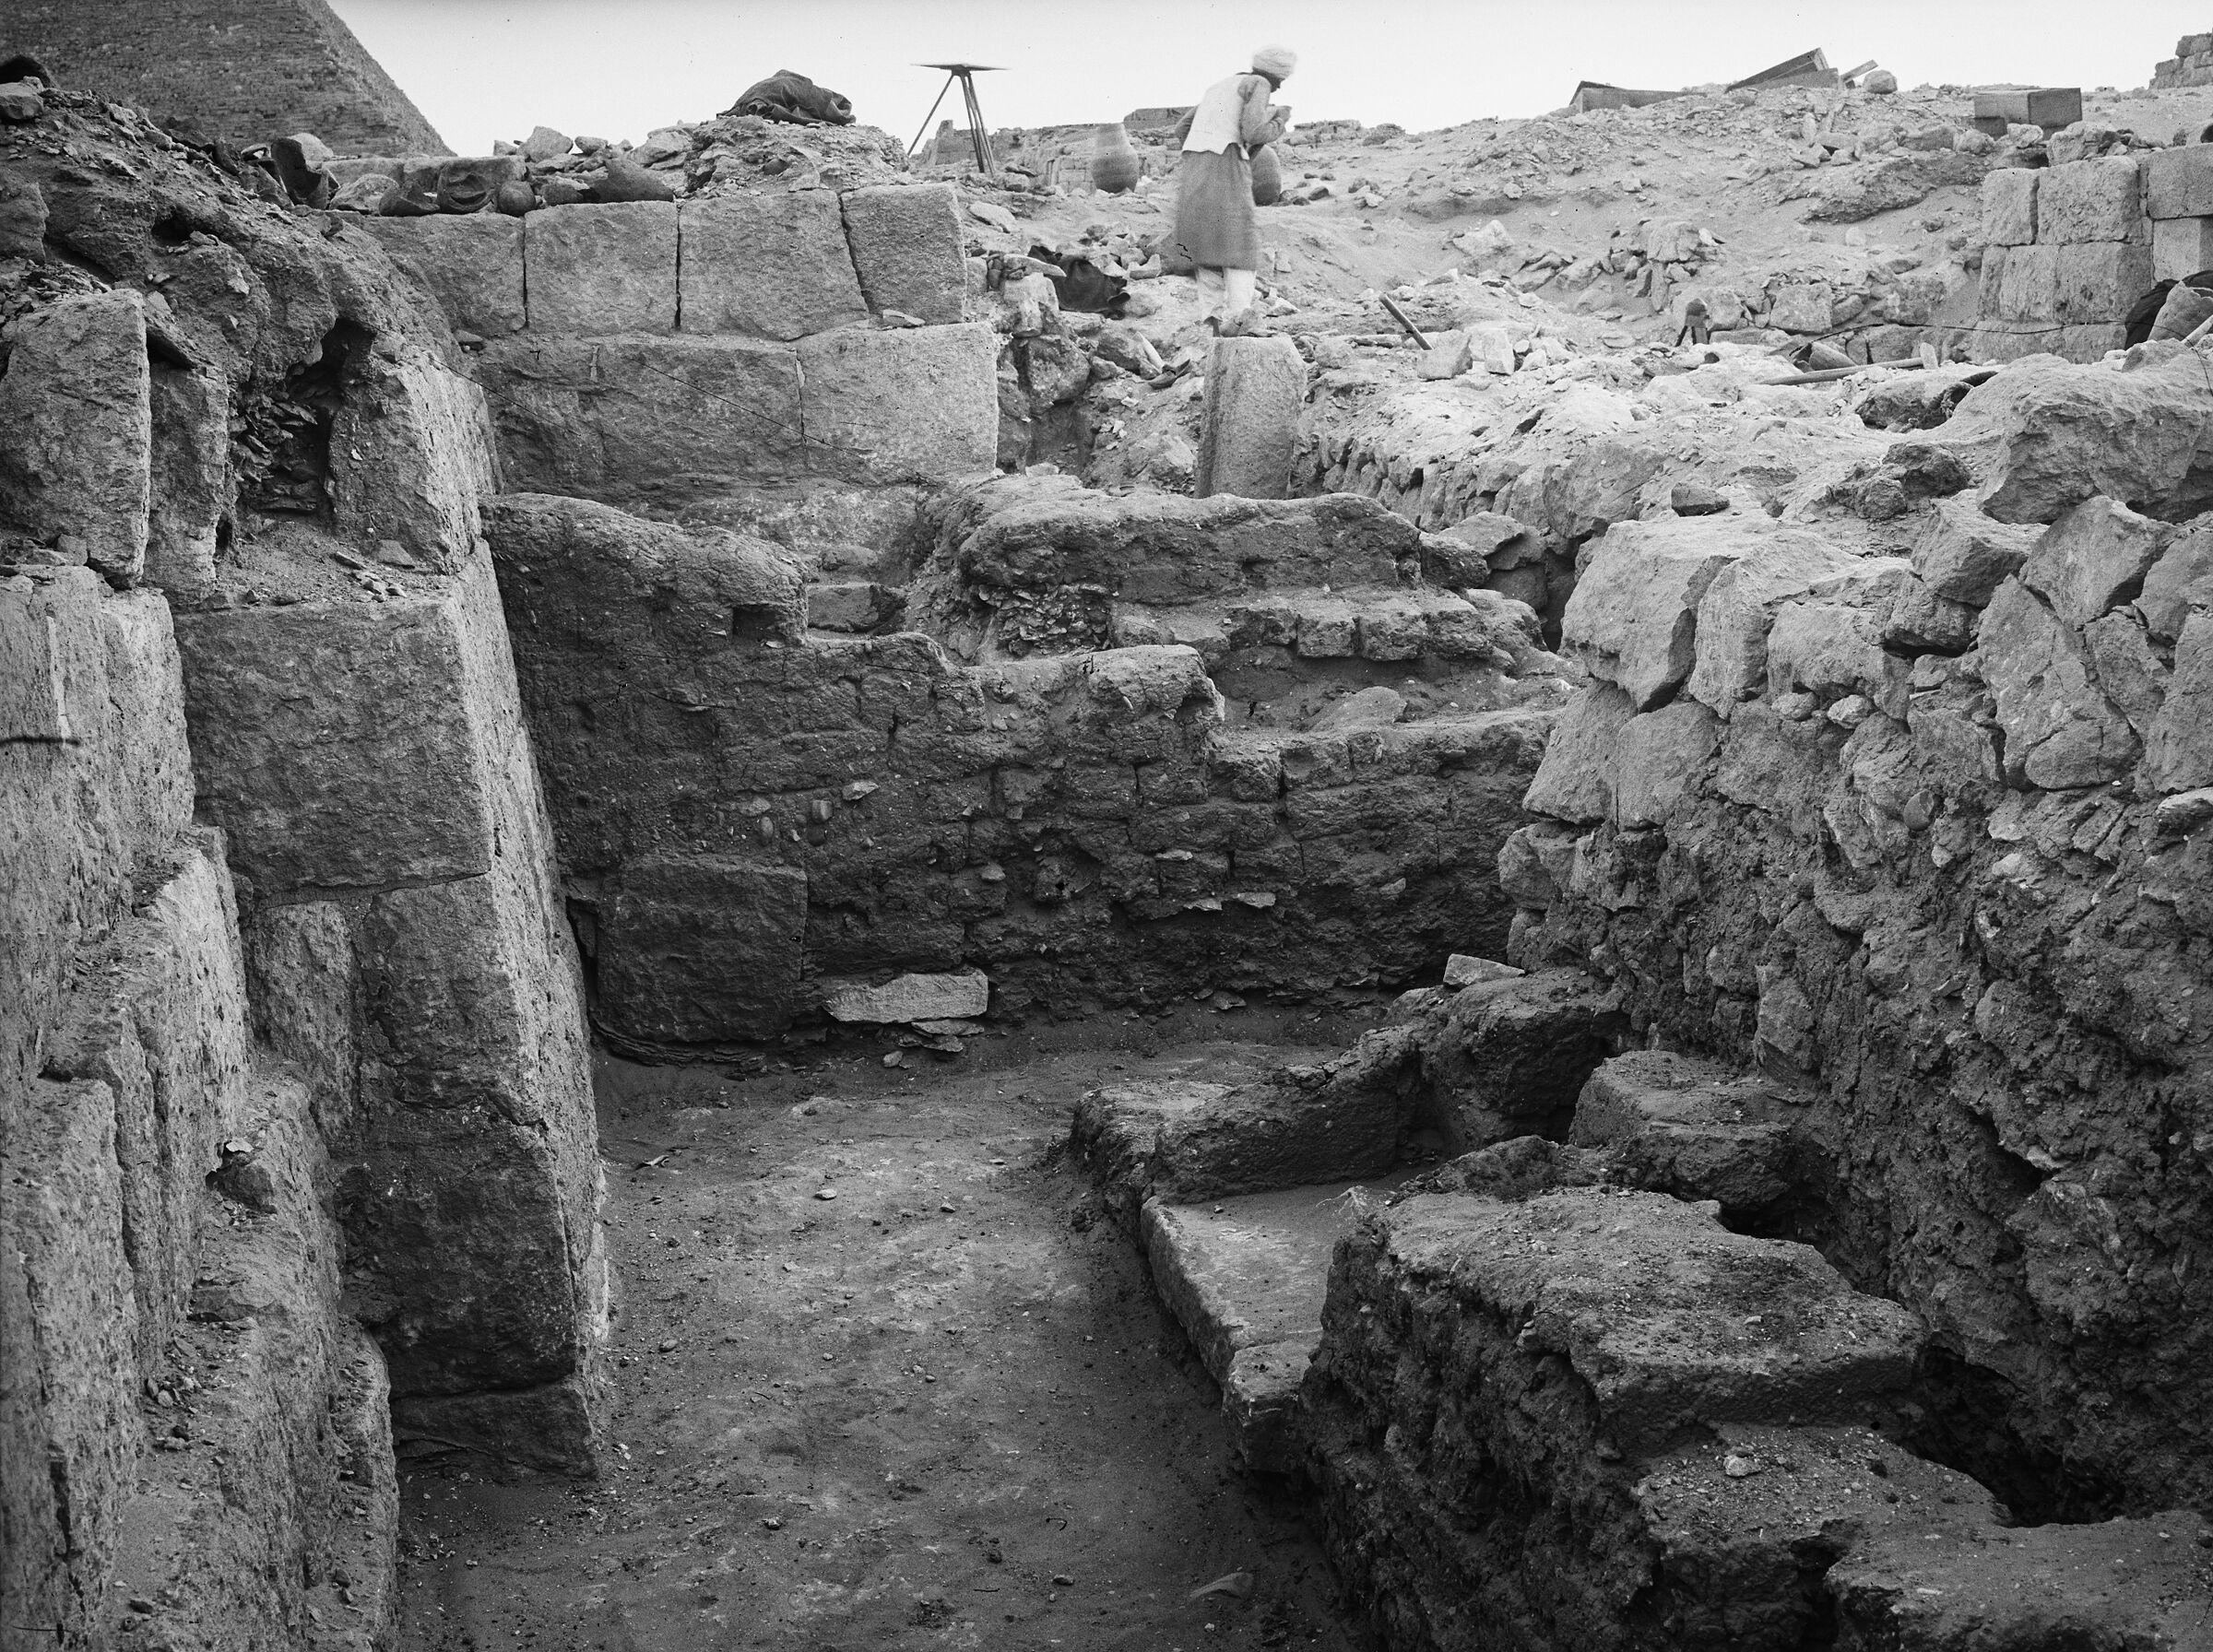 Western Cemetery: Site: Giza; View: G 1021, G 1023, G 1011, G 1025, G 1022